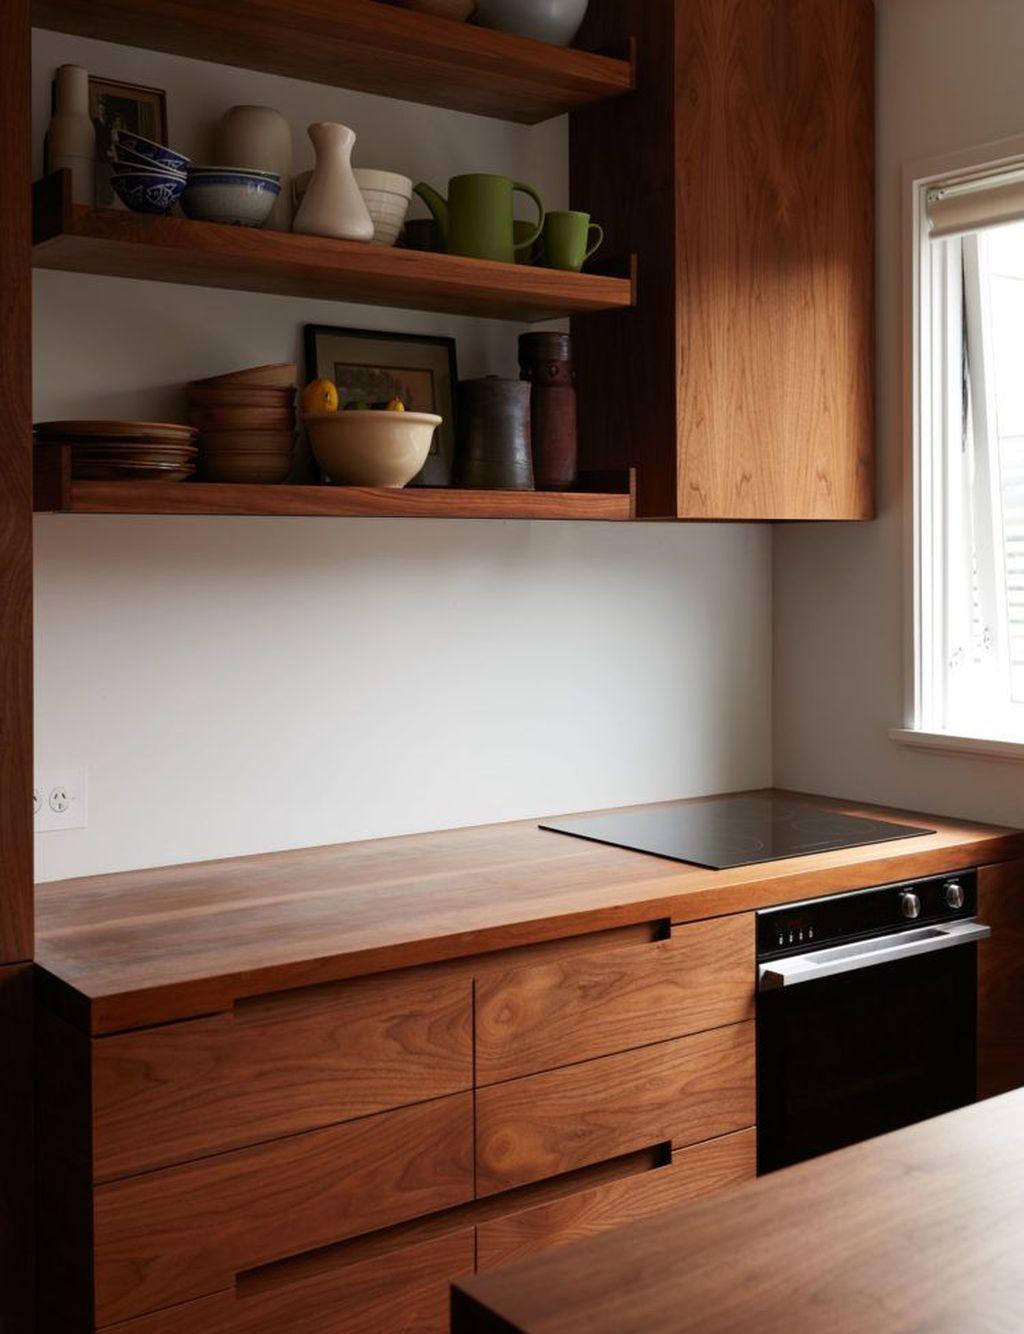 Popular Apartment Kitchen Design Ideas You Should Copy 12